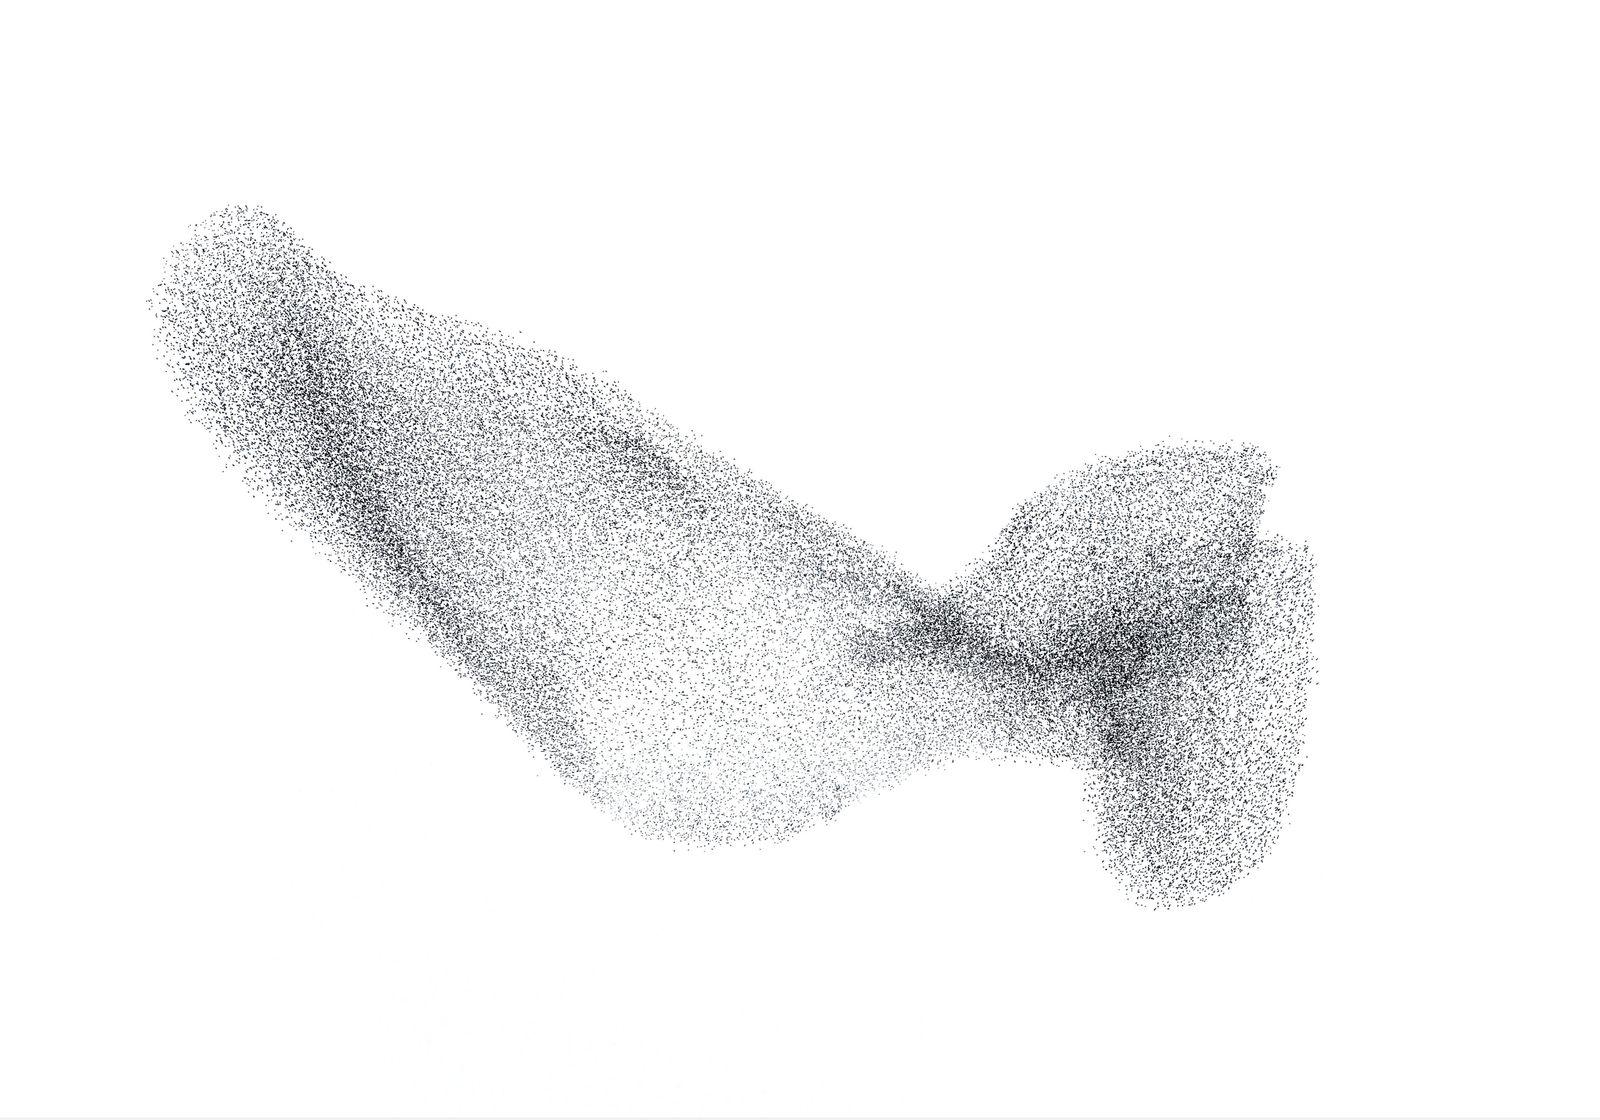 U81215928-20180621114826407-MMMRI-1